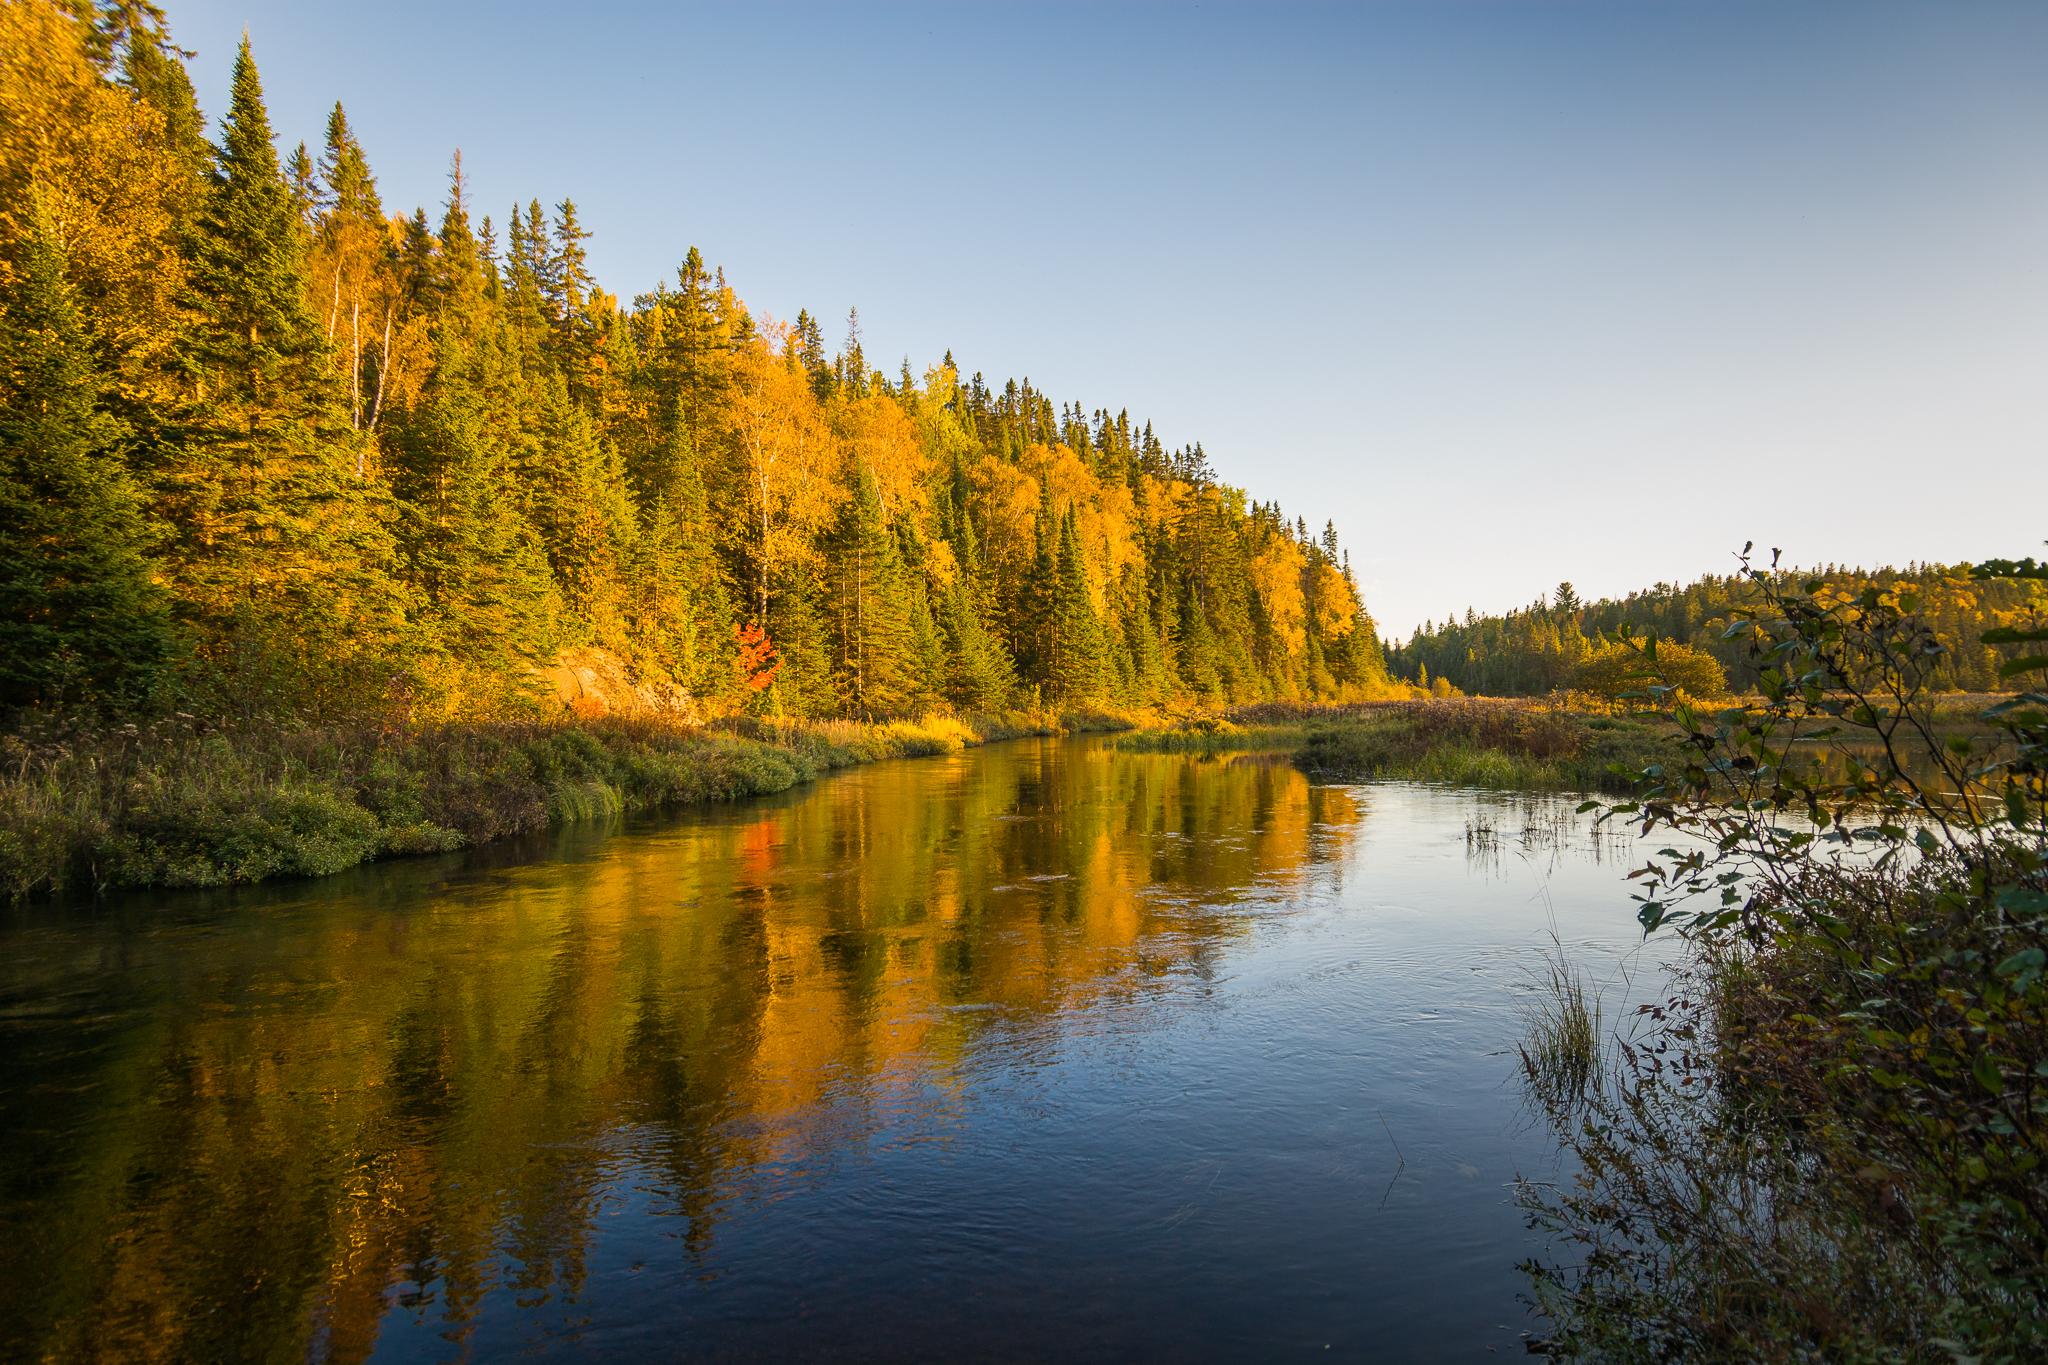 Pond Beside the Old Railway Bike Trail (1/200s, f/4, ISO200)